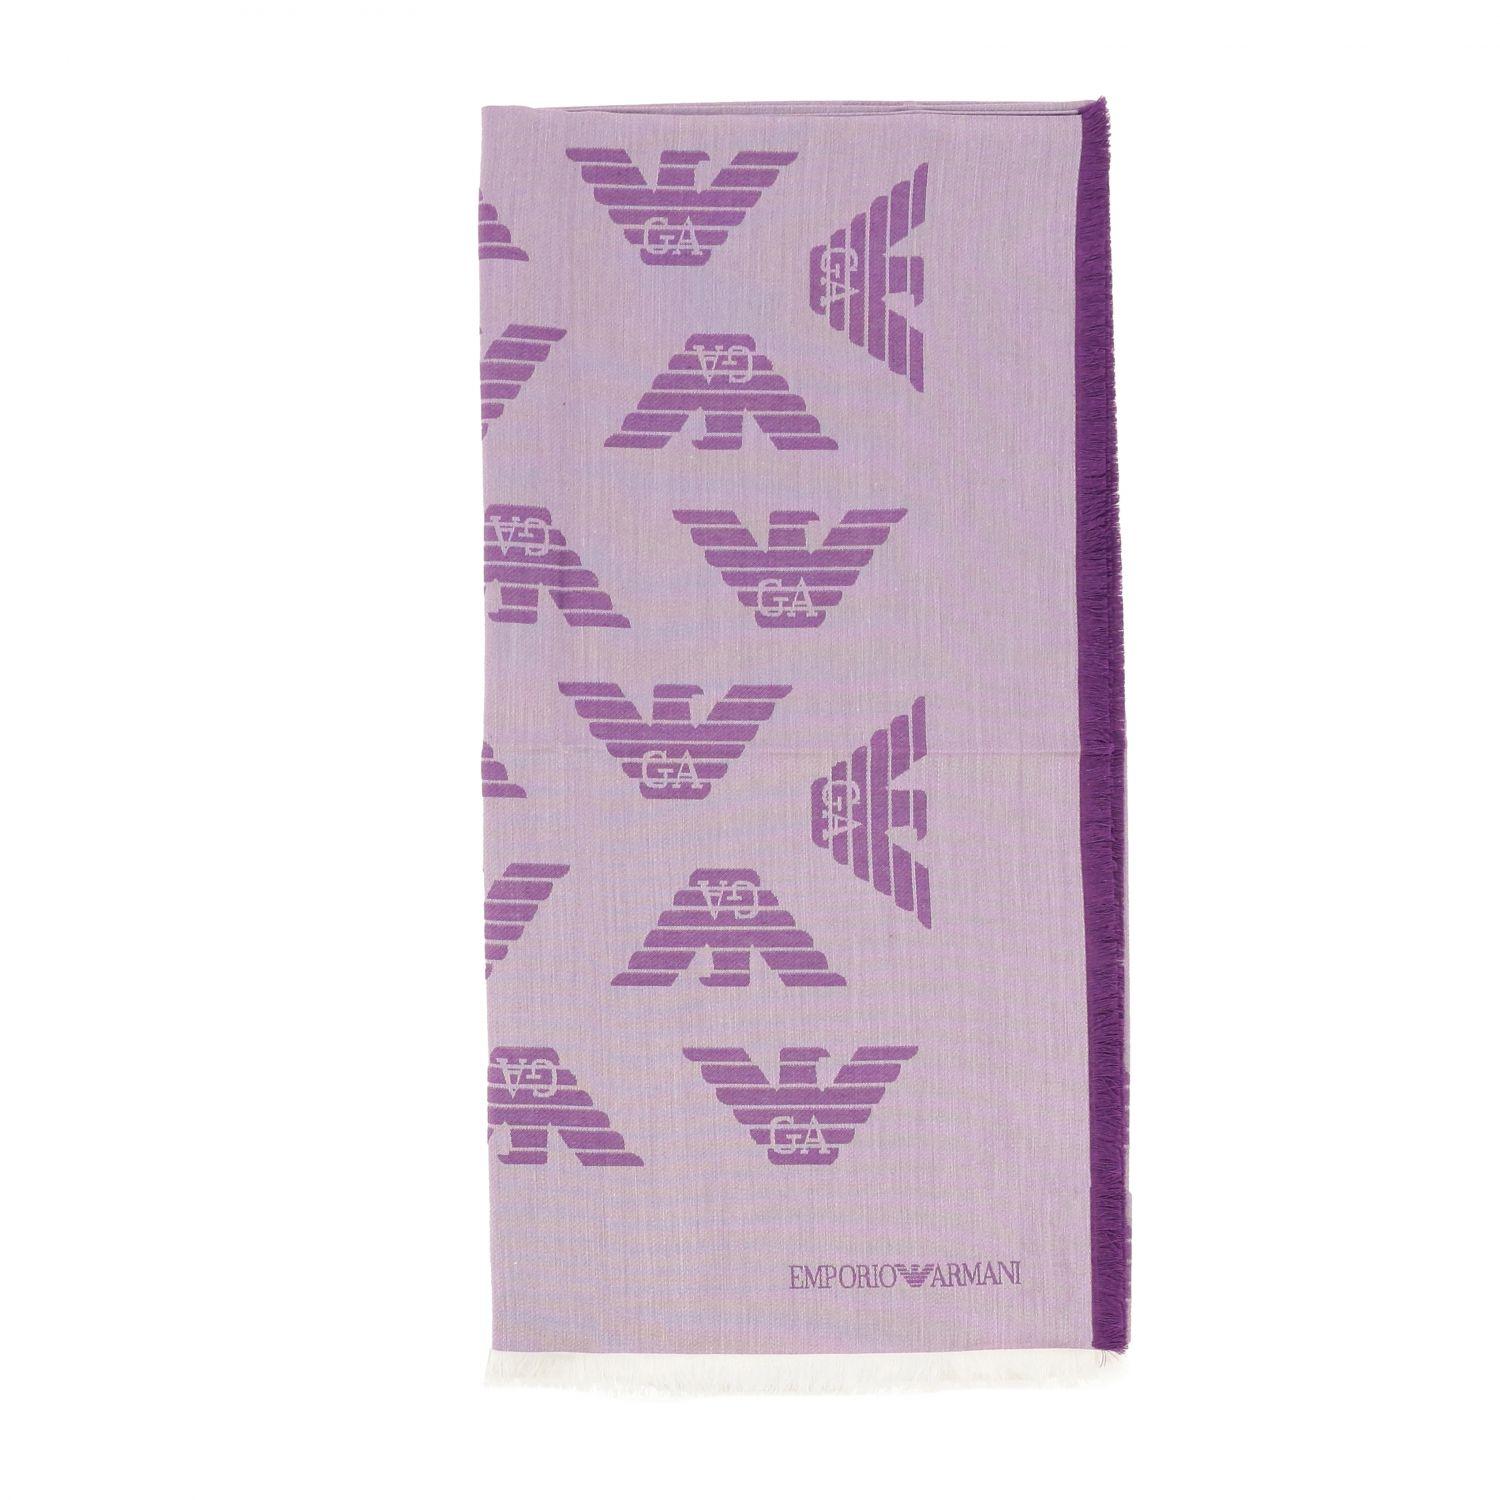 Bufanda mujer Emporio Armani violeta 1